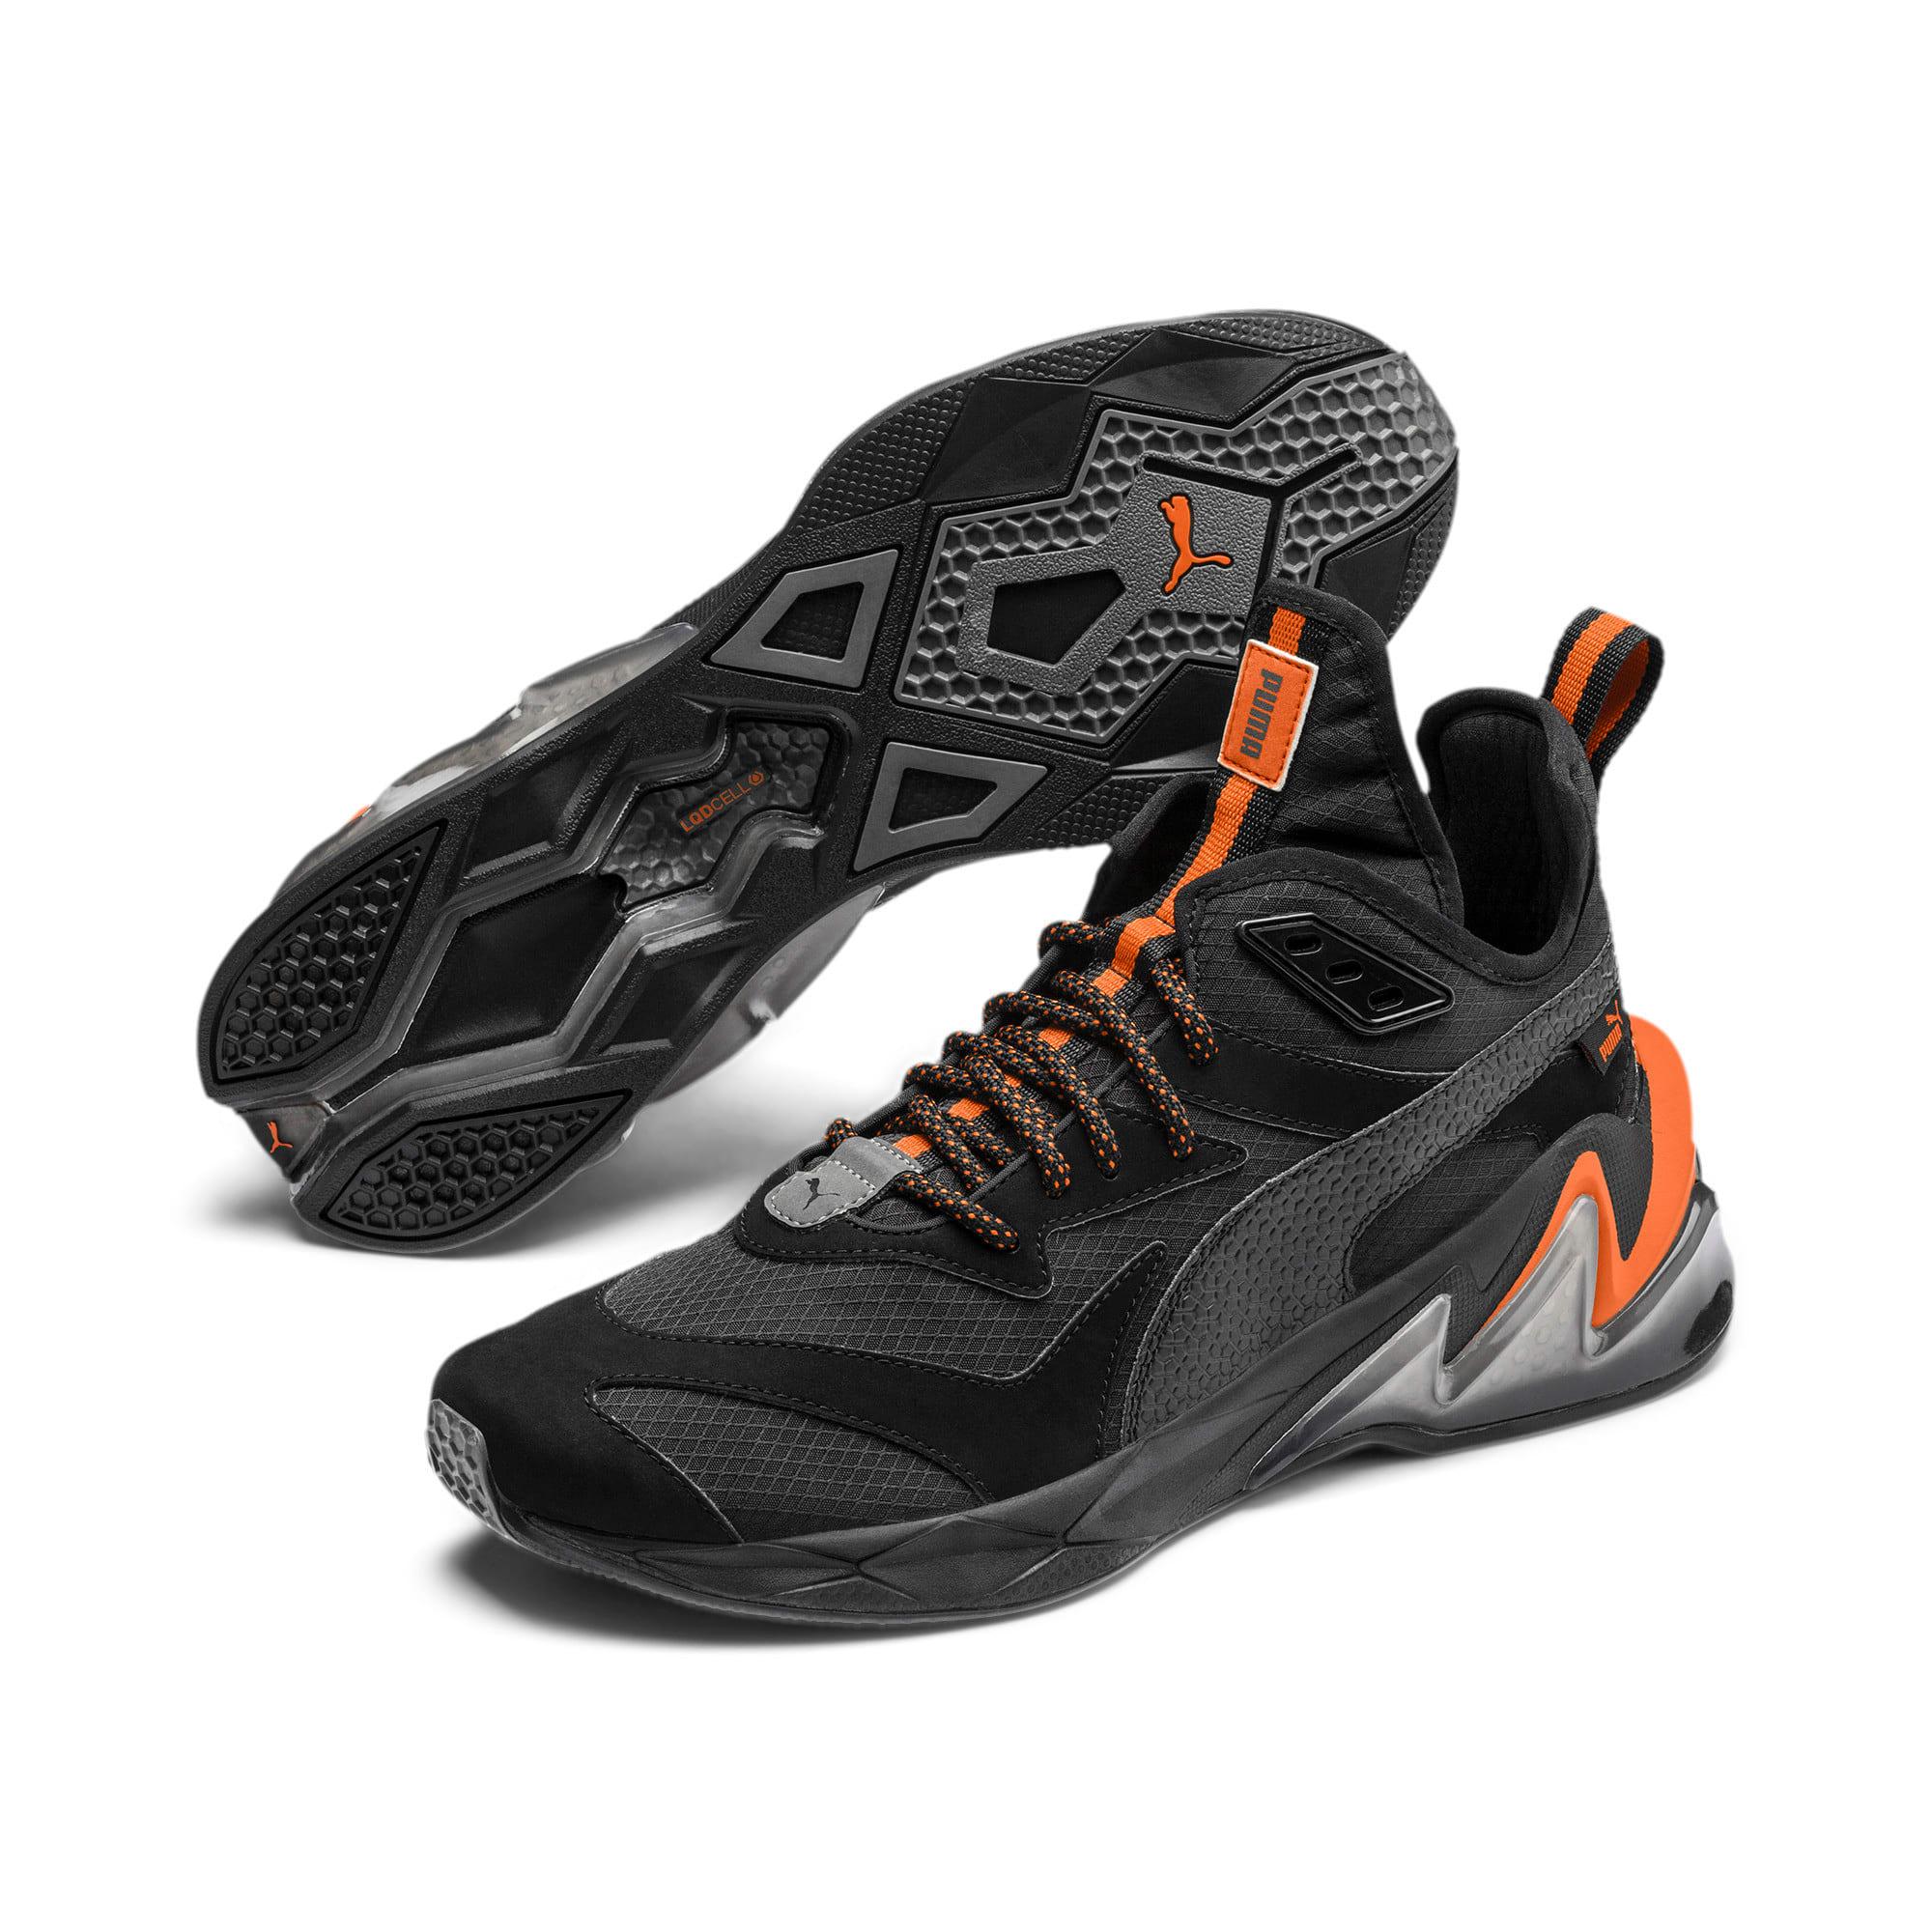 Thumbnail 3 of LQDCELL Origin Terrain Men's Training Shoes, Puma Black-Jaffa Orange, medium